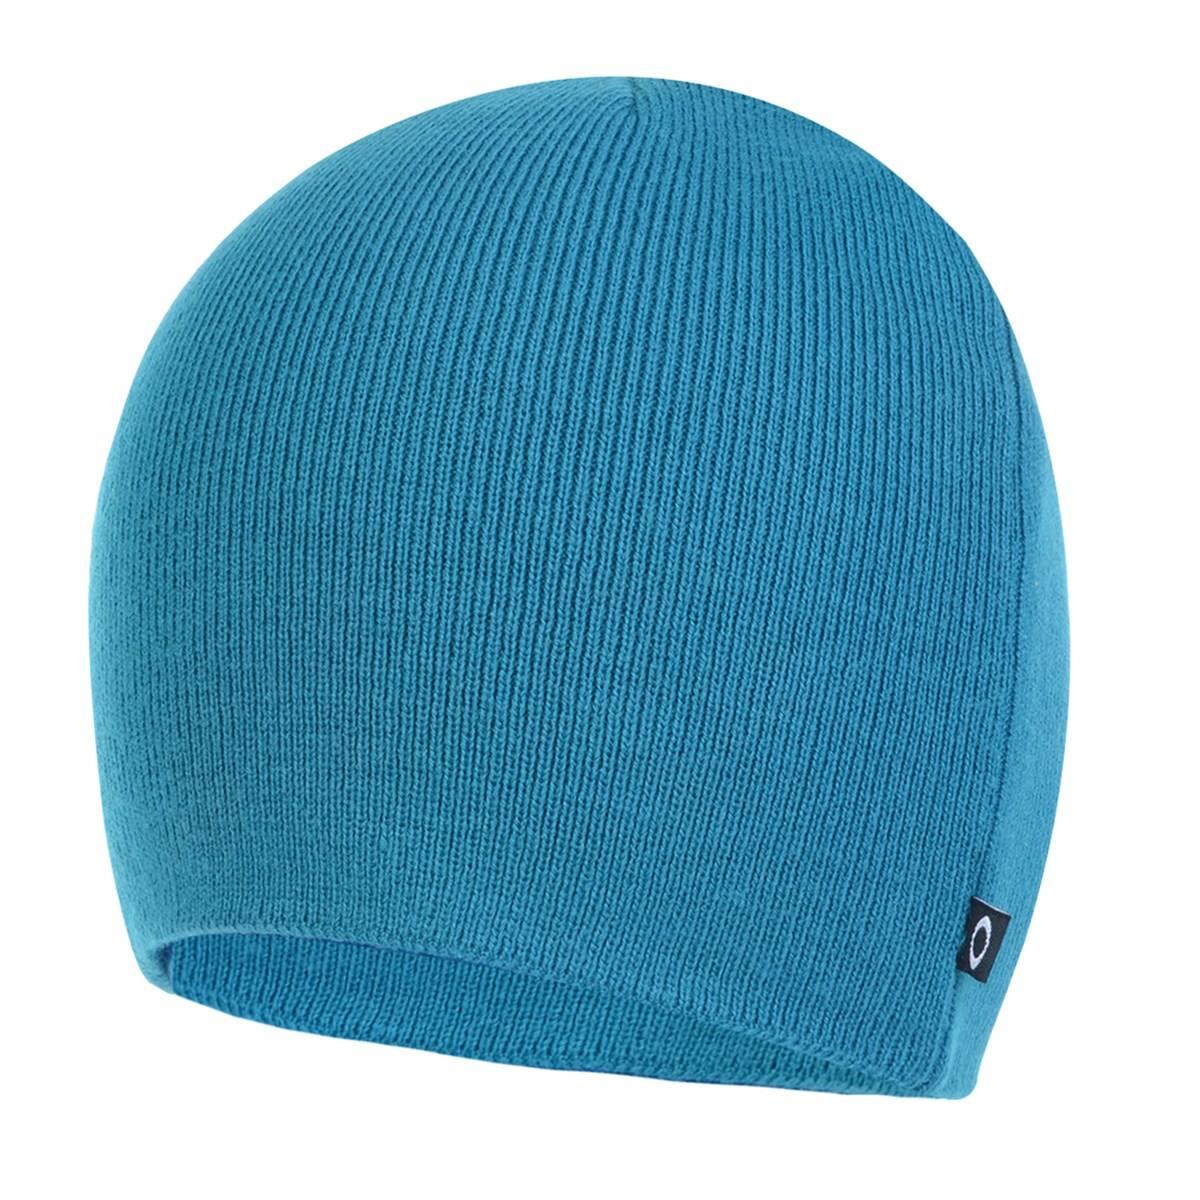 afab35a9173d6 Gorro Masculino Oakley Fine Knit Beanie Aurora Azul - R  99,90 em ...